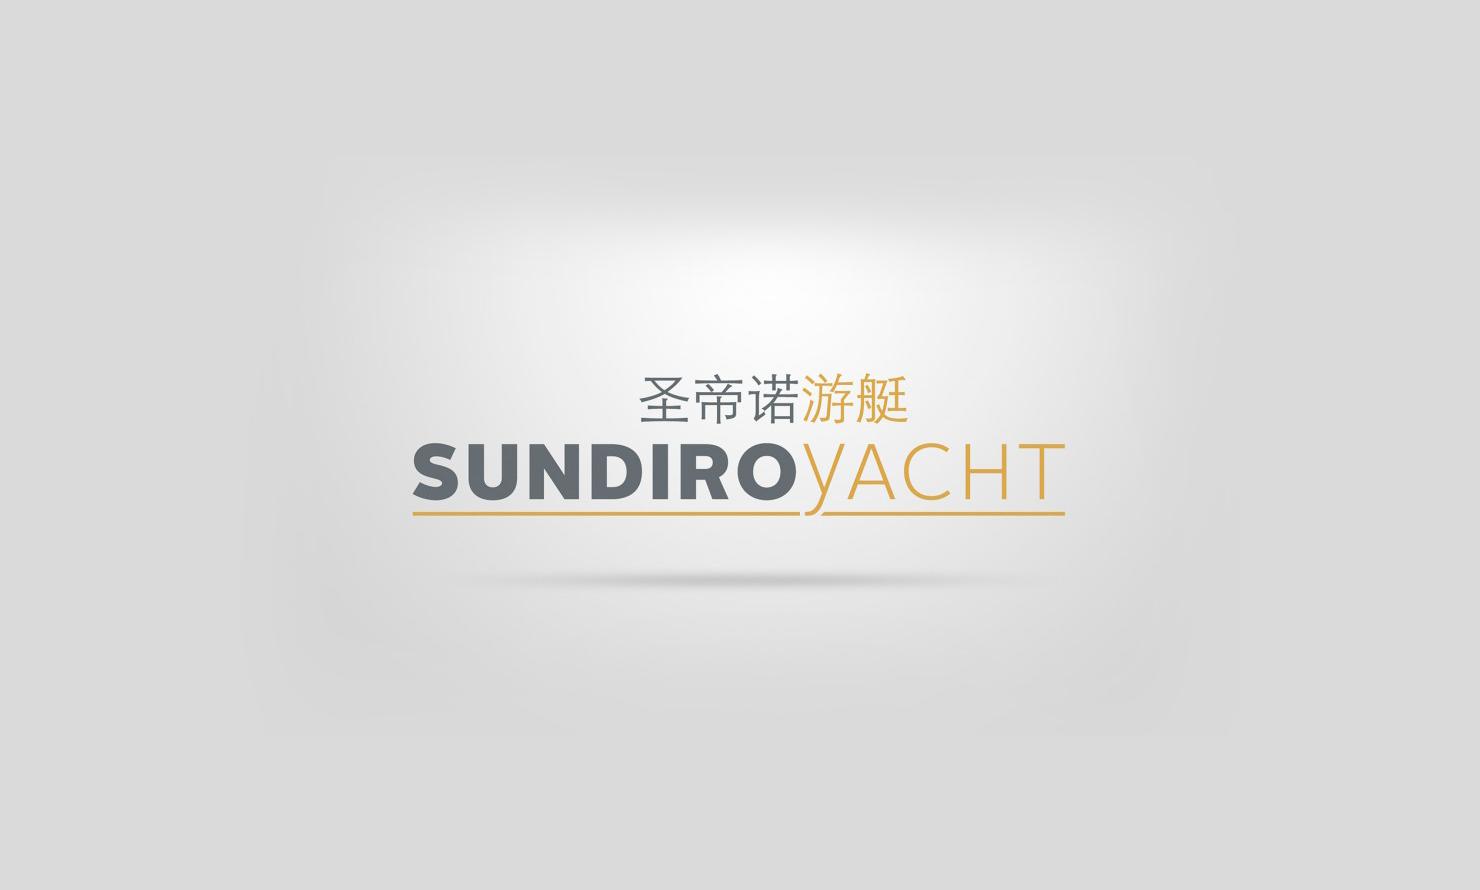 https://kubelibre.com/uploads/Slider-work-tutti-clienti/sundiro-yacht-l-eccelenza-italiana-sbarca-in-cina-6.jpg